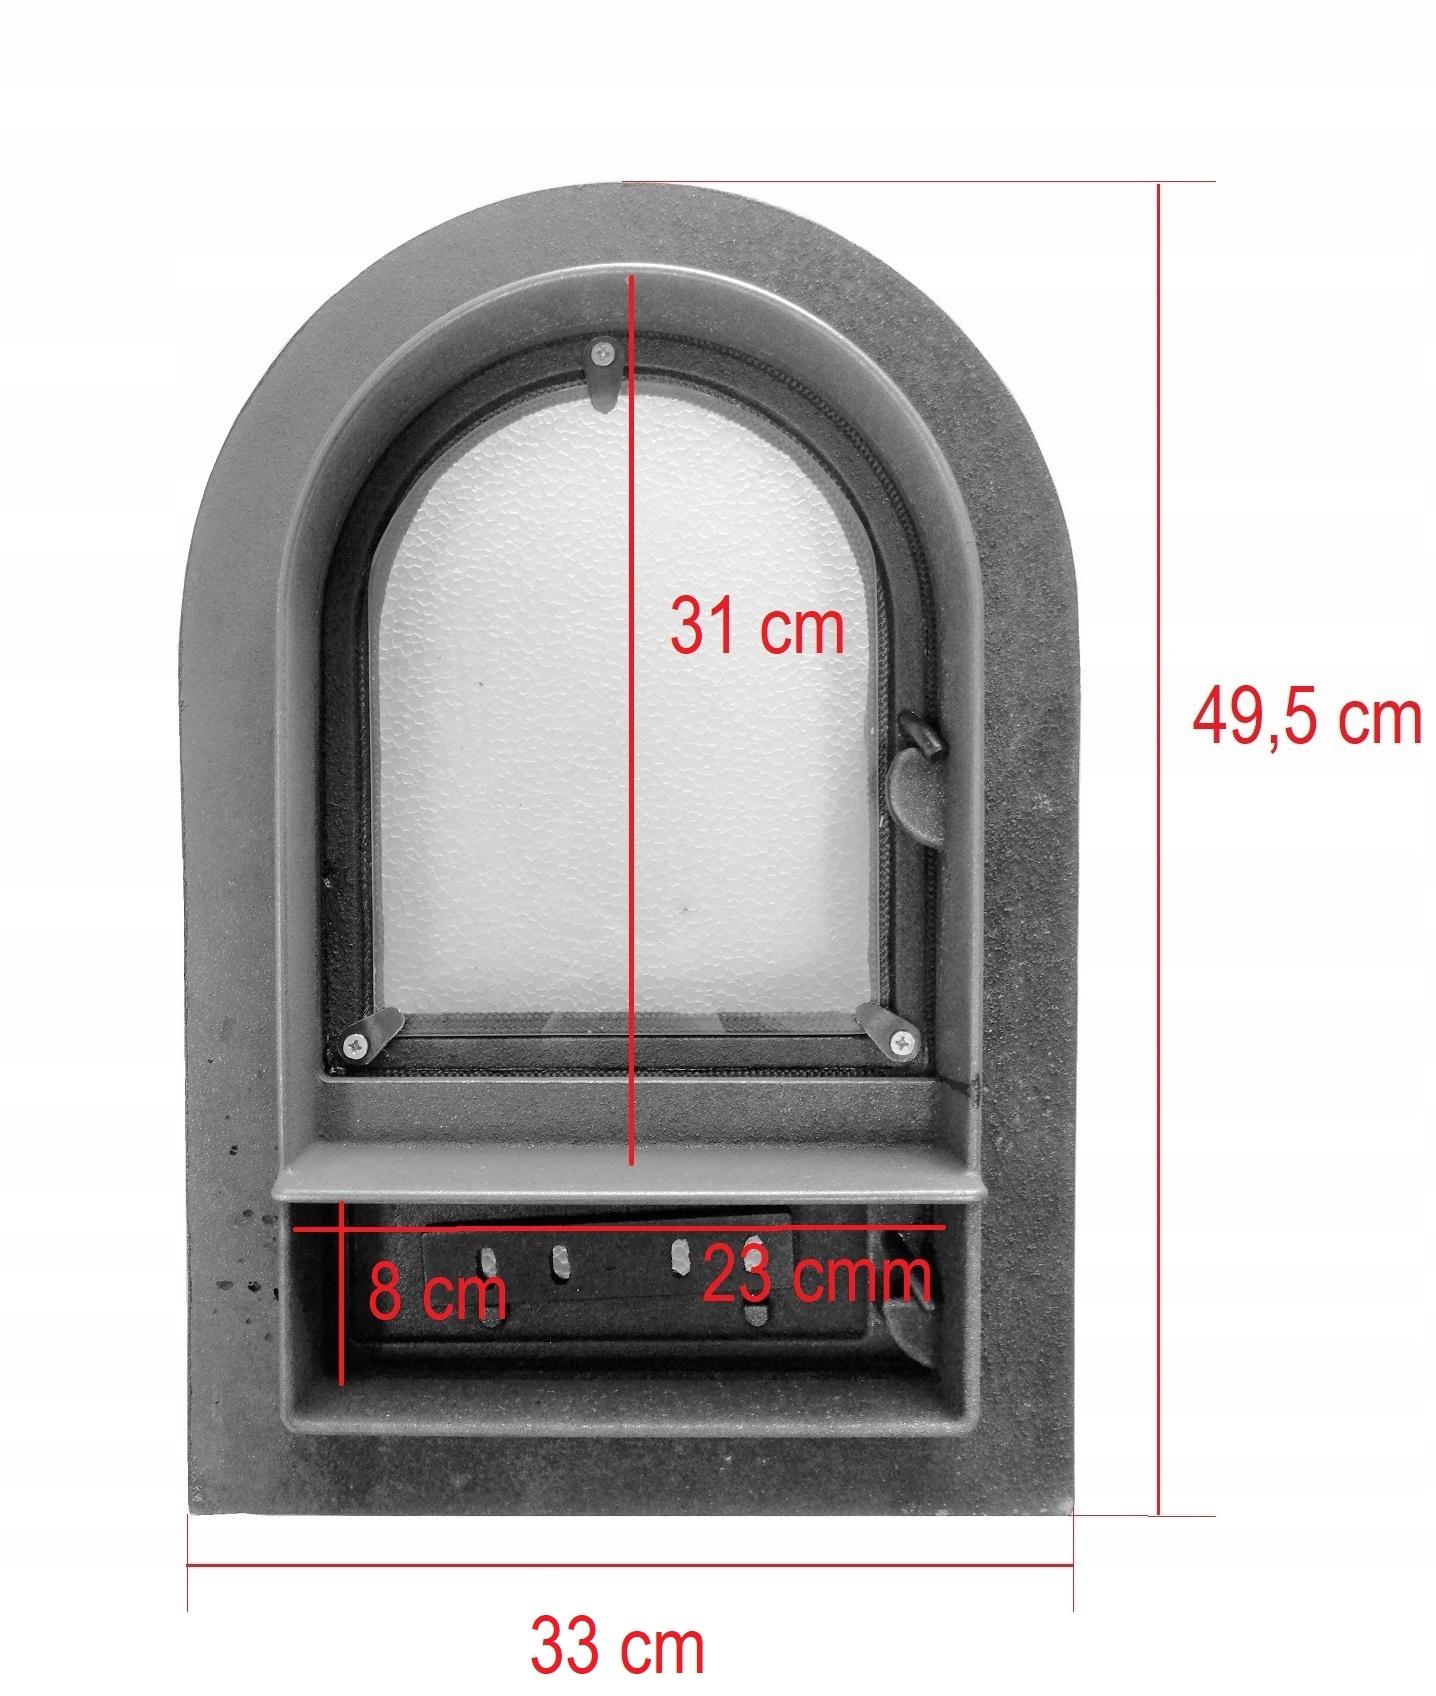 liatinové dvere do udiarne so sklom 49x33 Kód produktu liatinové DVERE so sklenenou pecou + popolník